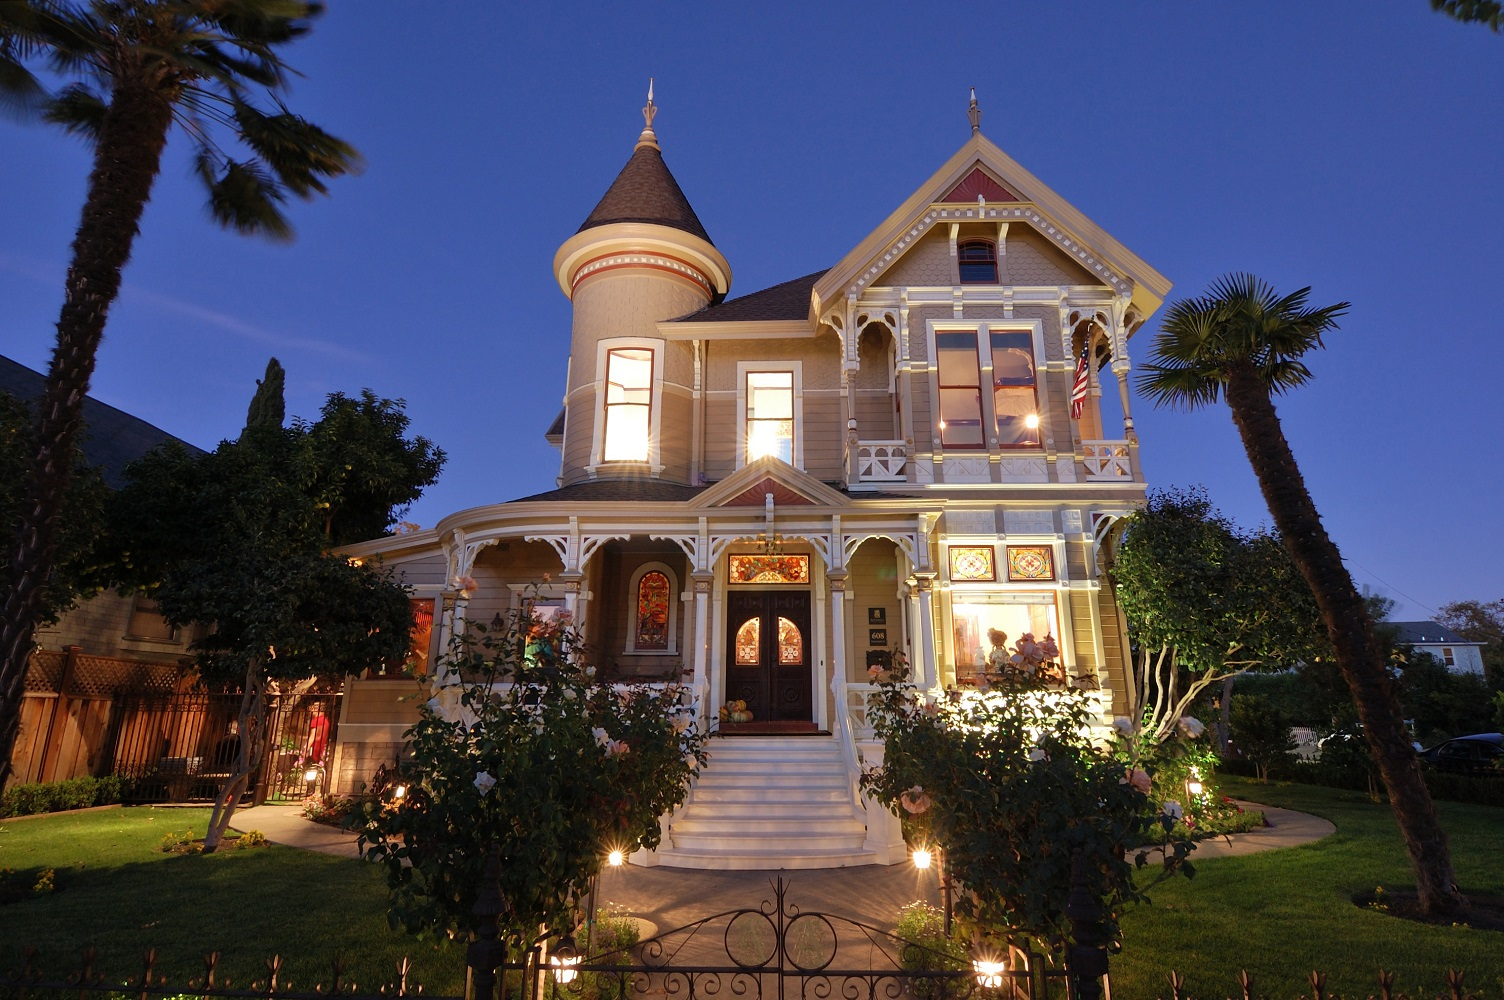 Ackerman House